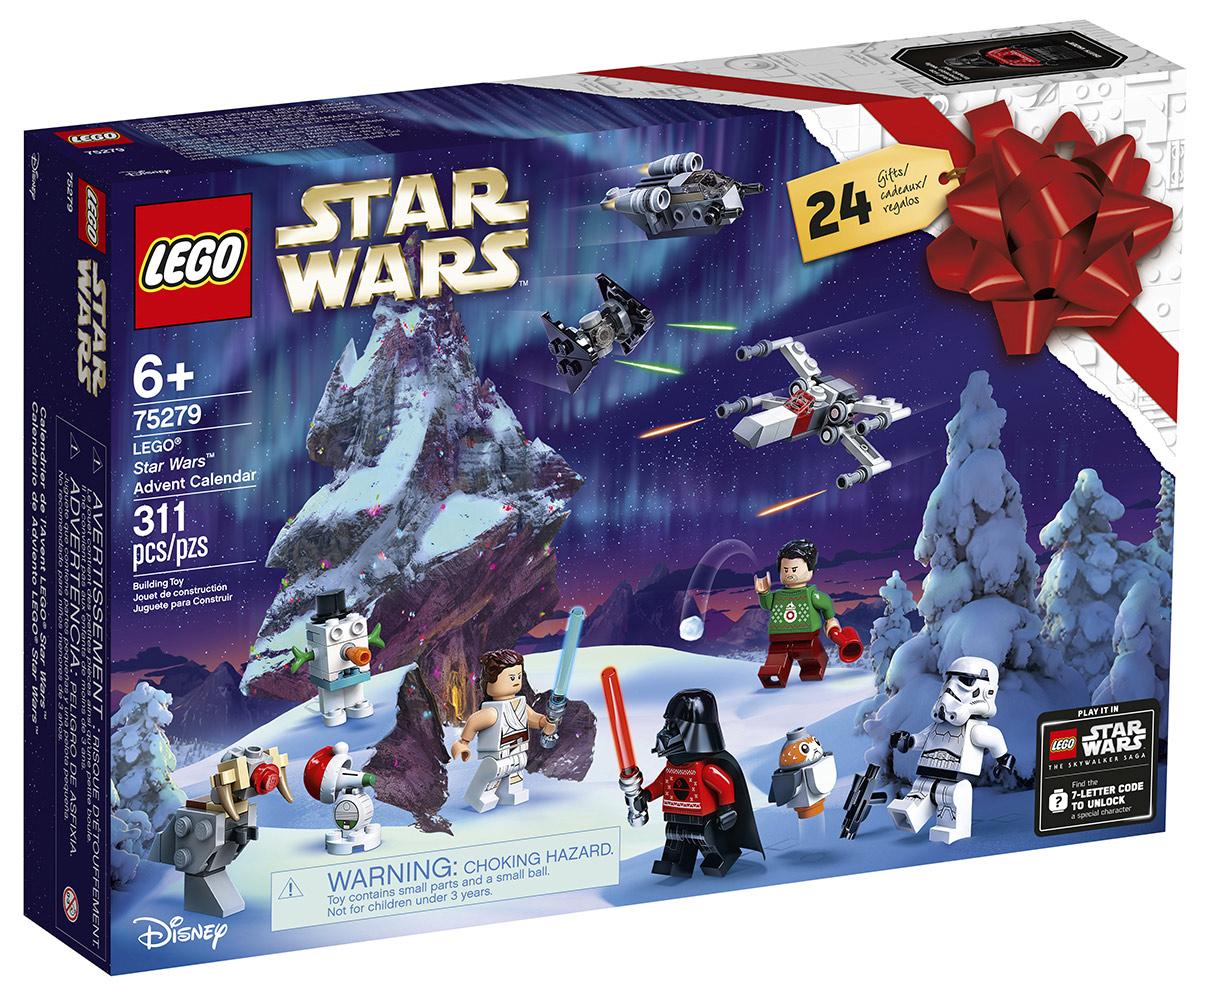 LEGO Star Wars Advent Calendar (Includes Unlock Code)